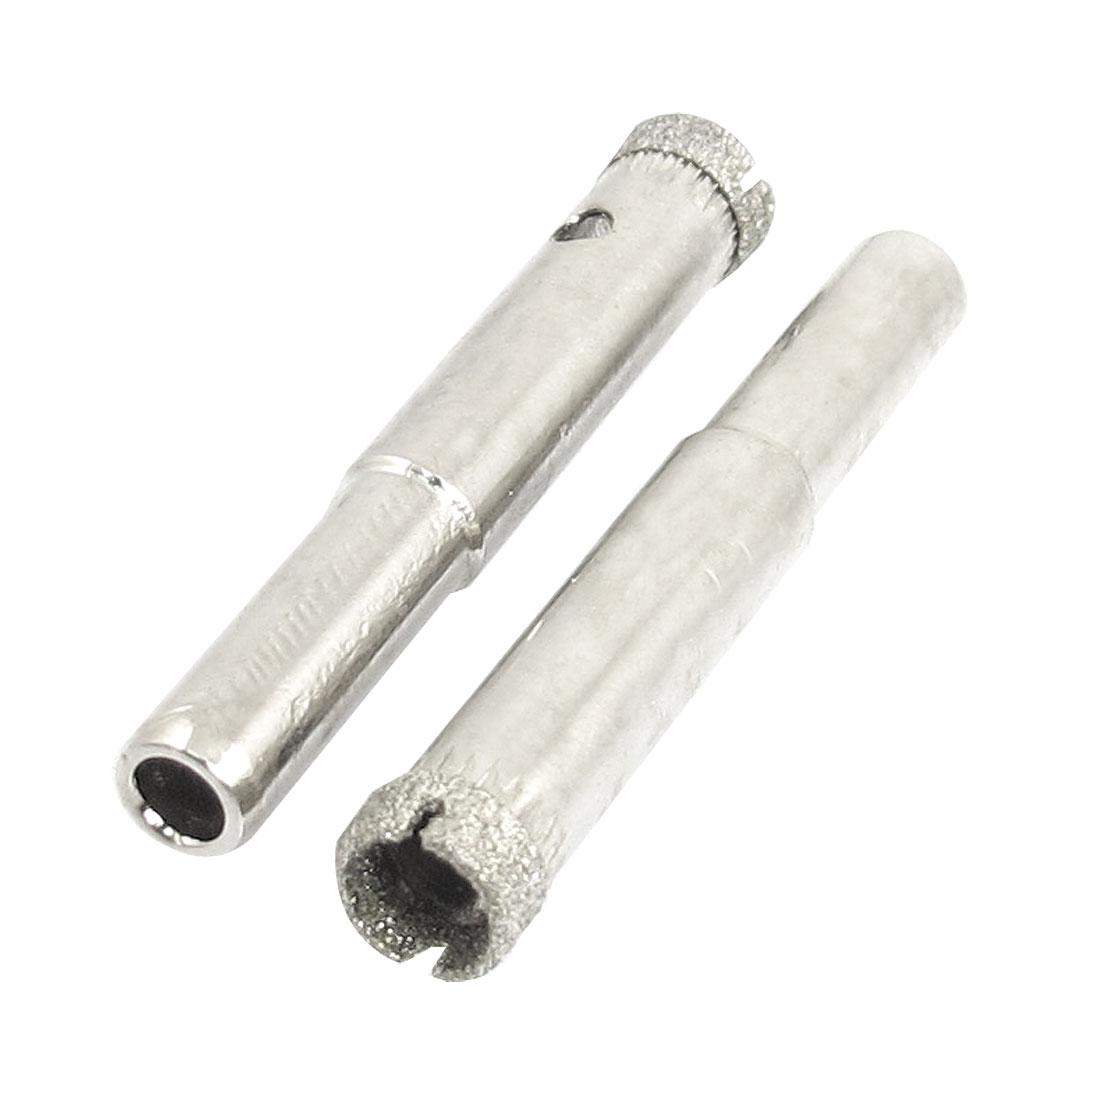 "2 Pcs Diamond Drill Bits 8mm 5/16"" Bottle Glass Tile Granite Hole Saw"